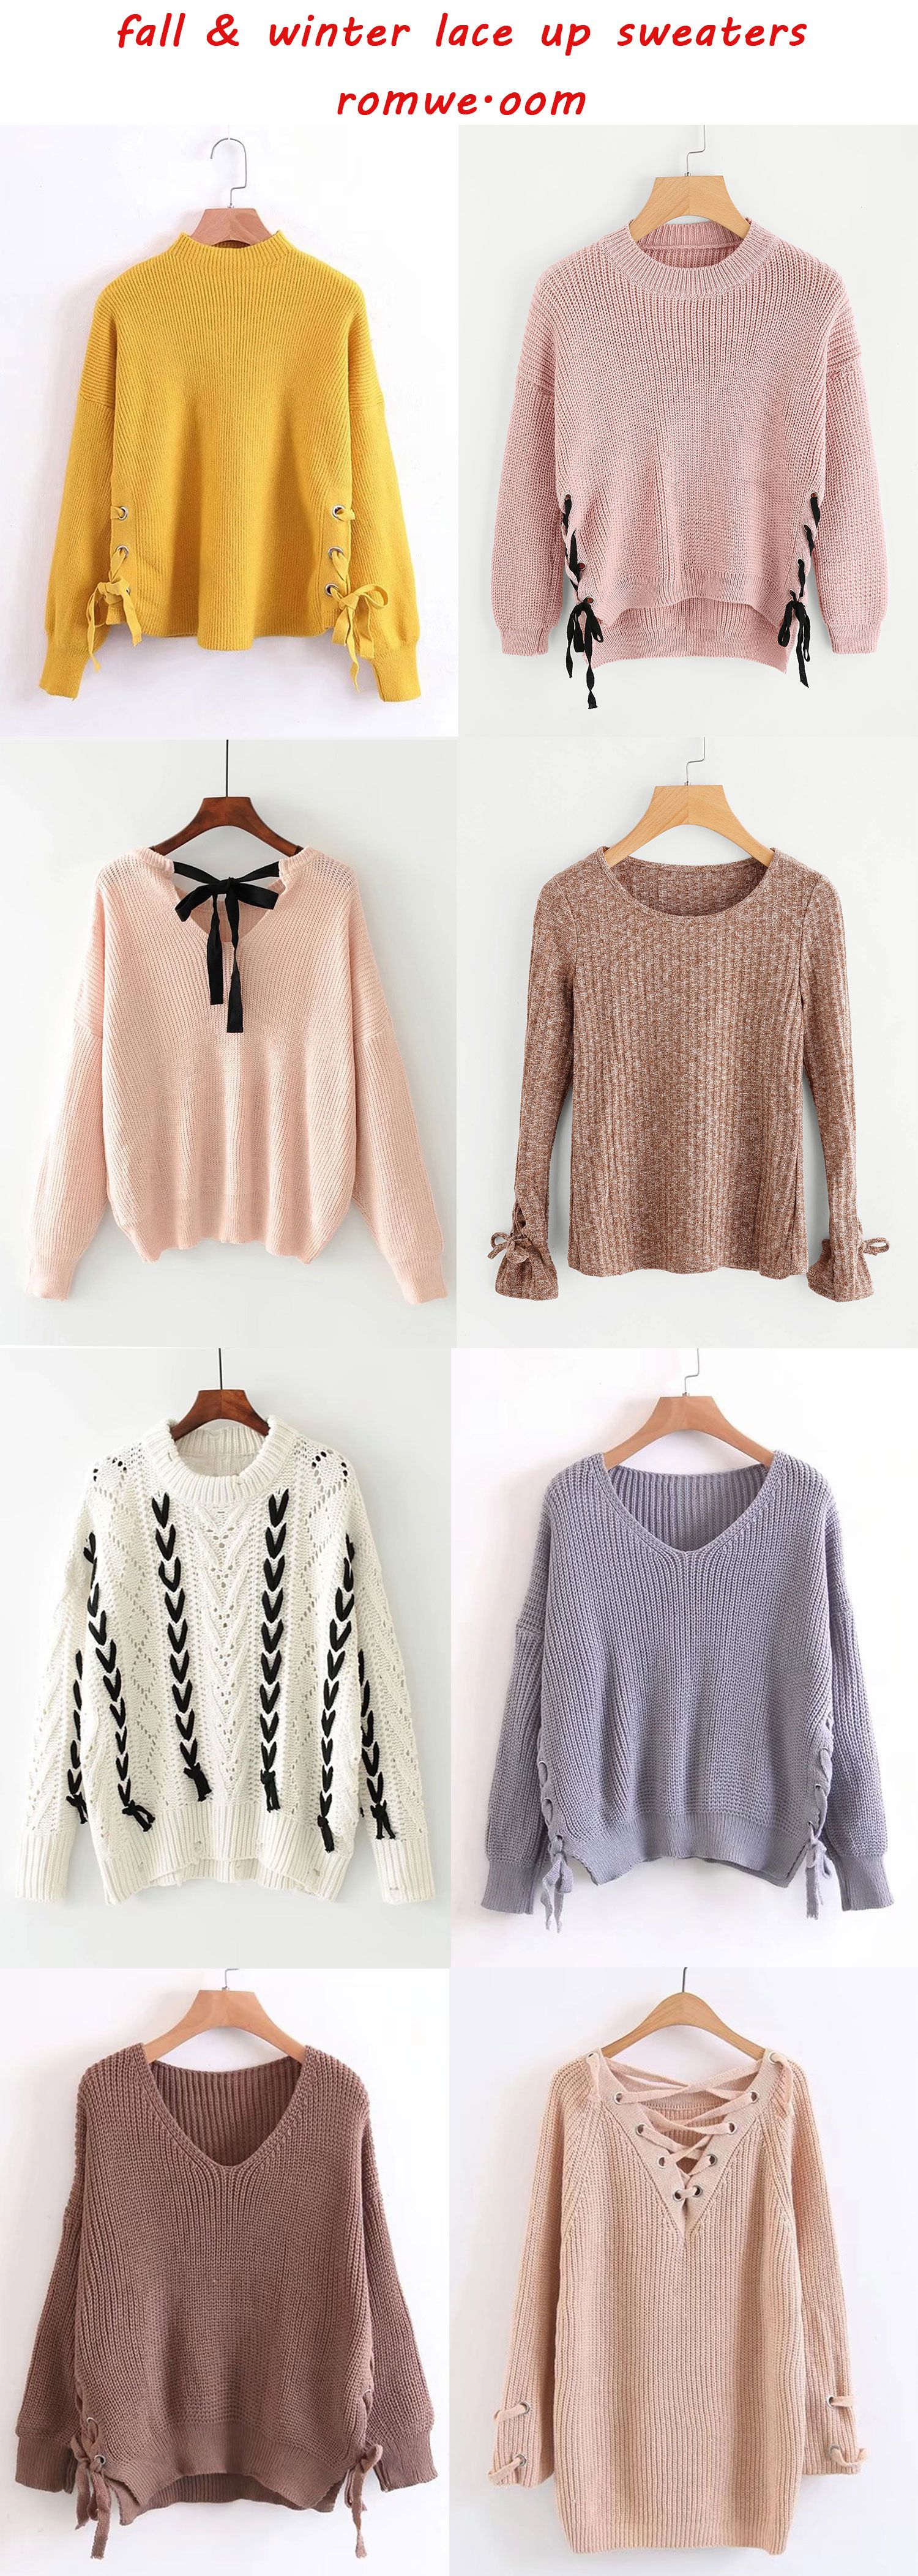 cute & cozy lace up sweaters - romwe.com | Romwe Hot Buy ...